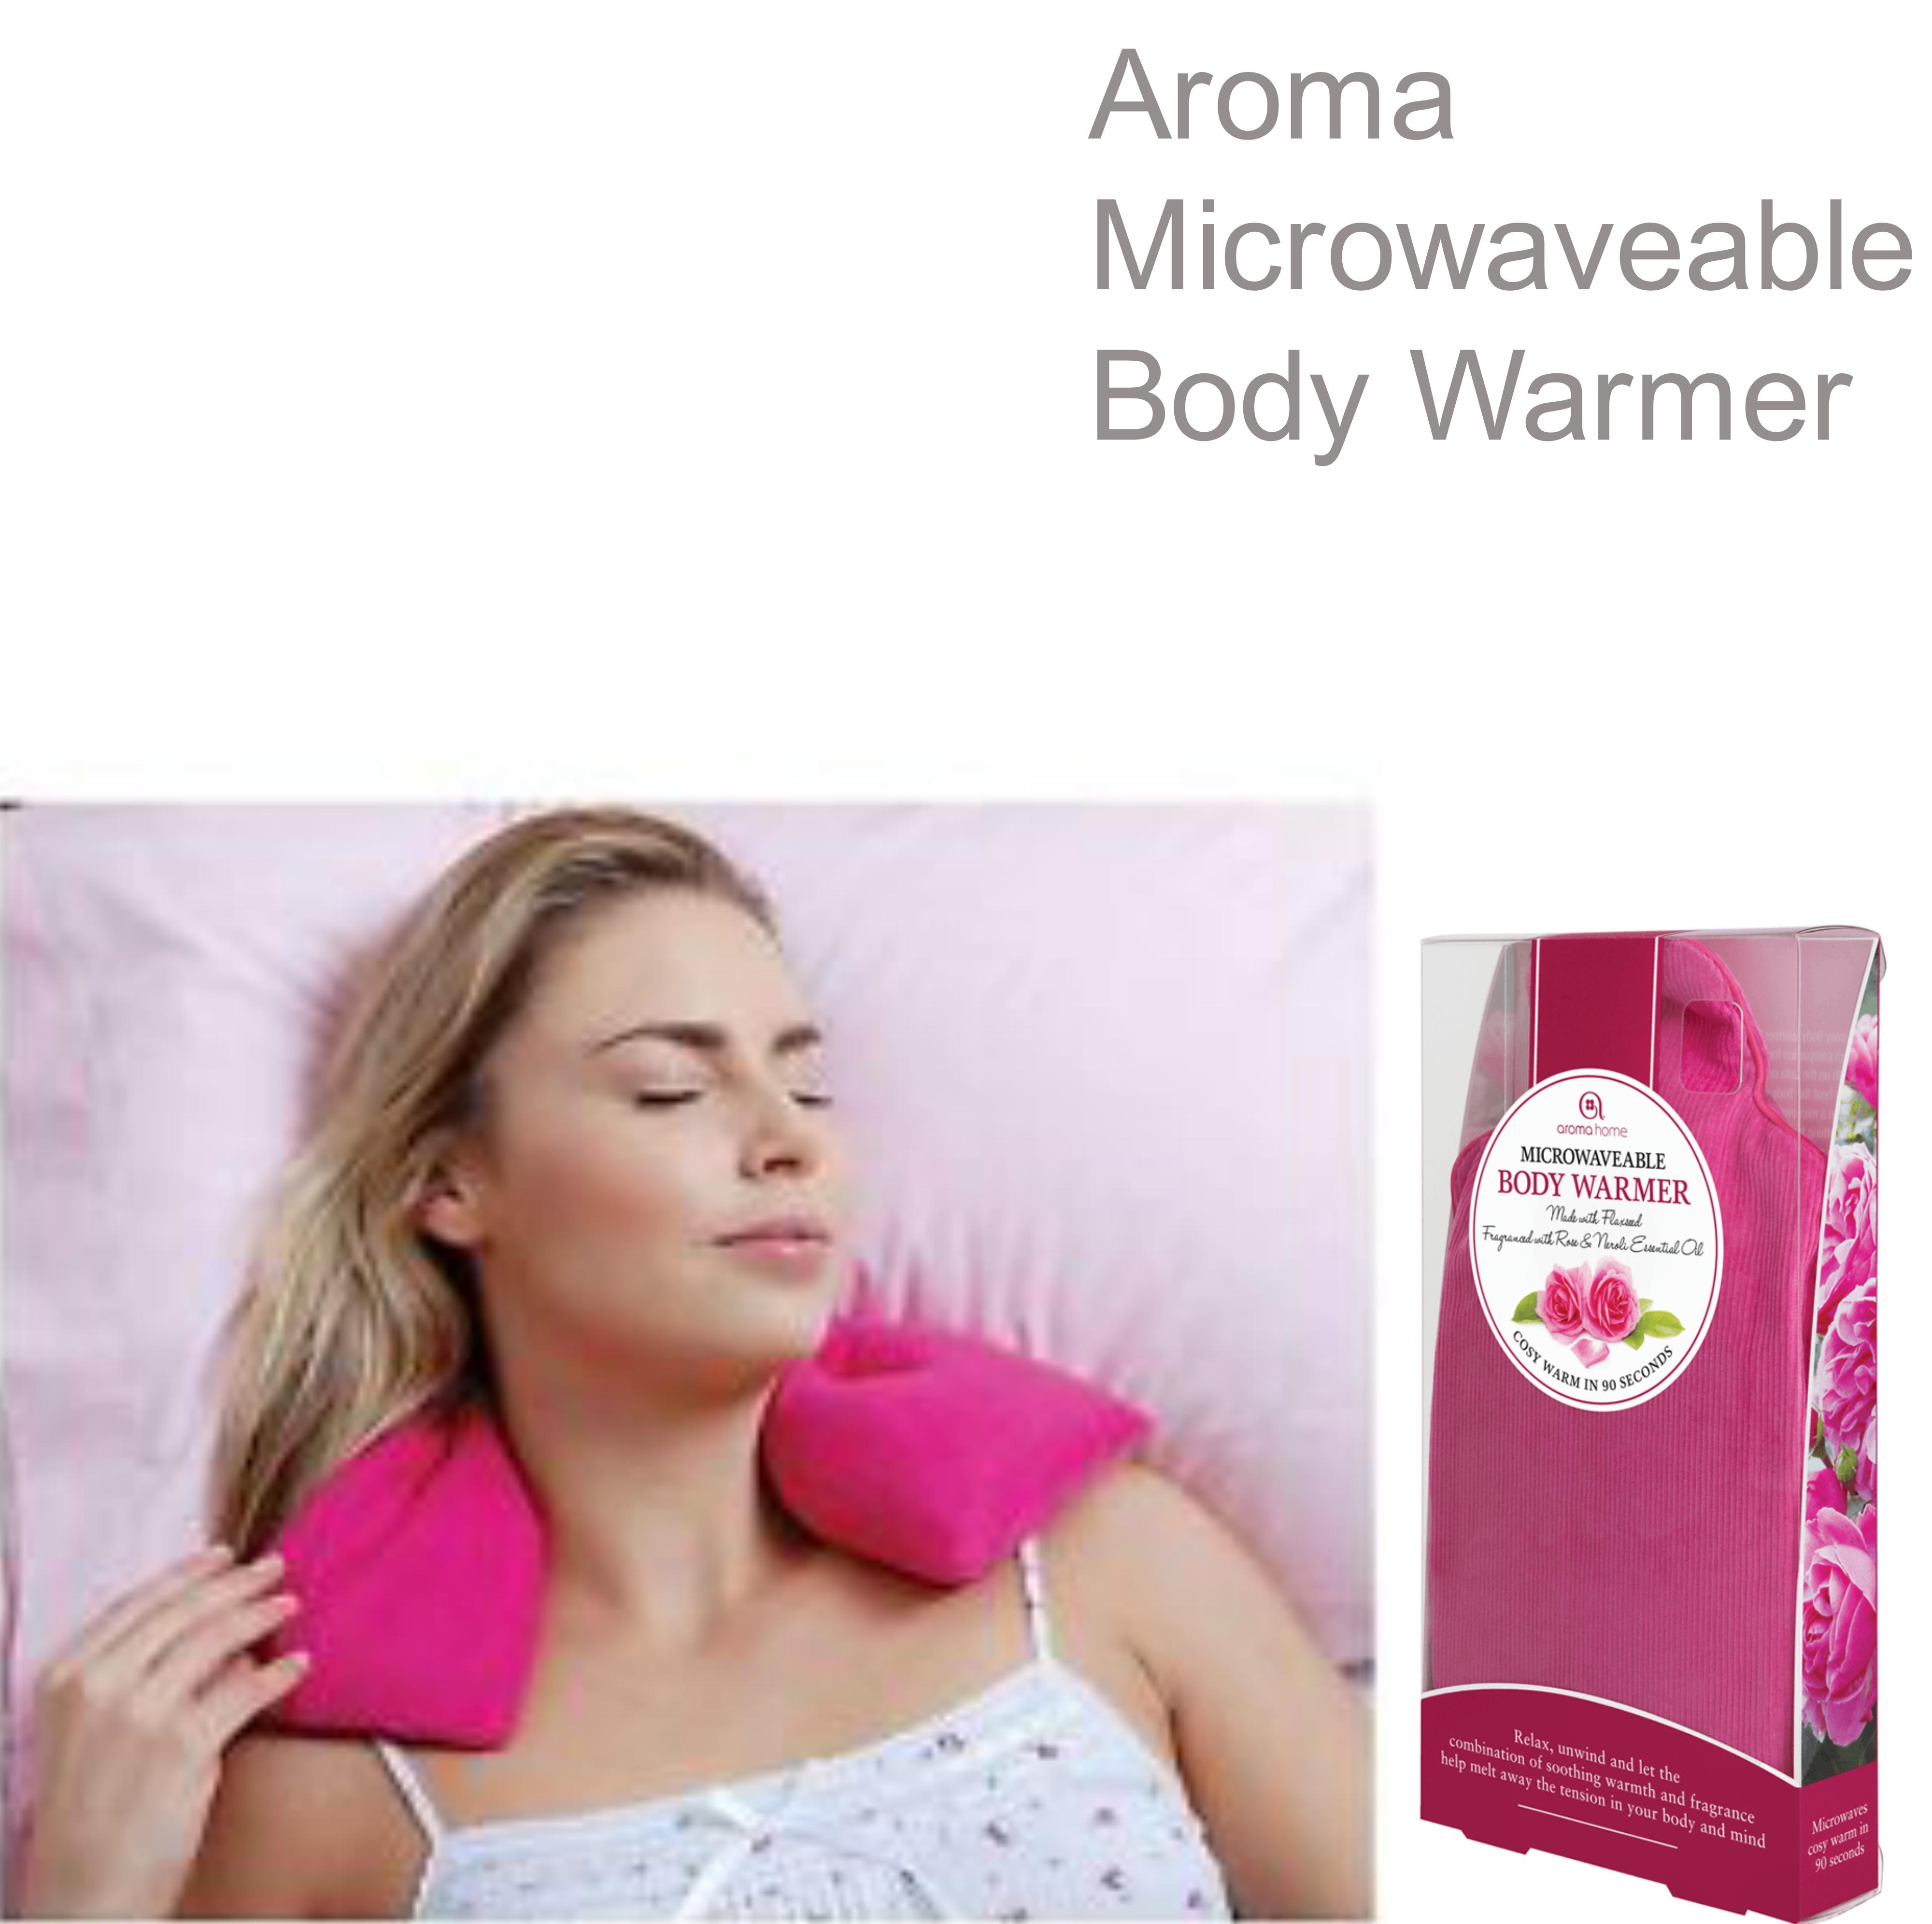 Aroma Home AROCORBW Perfect Body Warmer Fuschia With New Rose & Neroli Fragrance